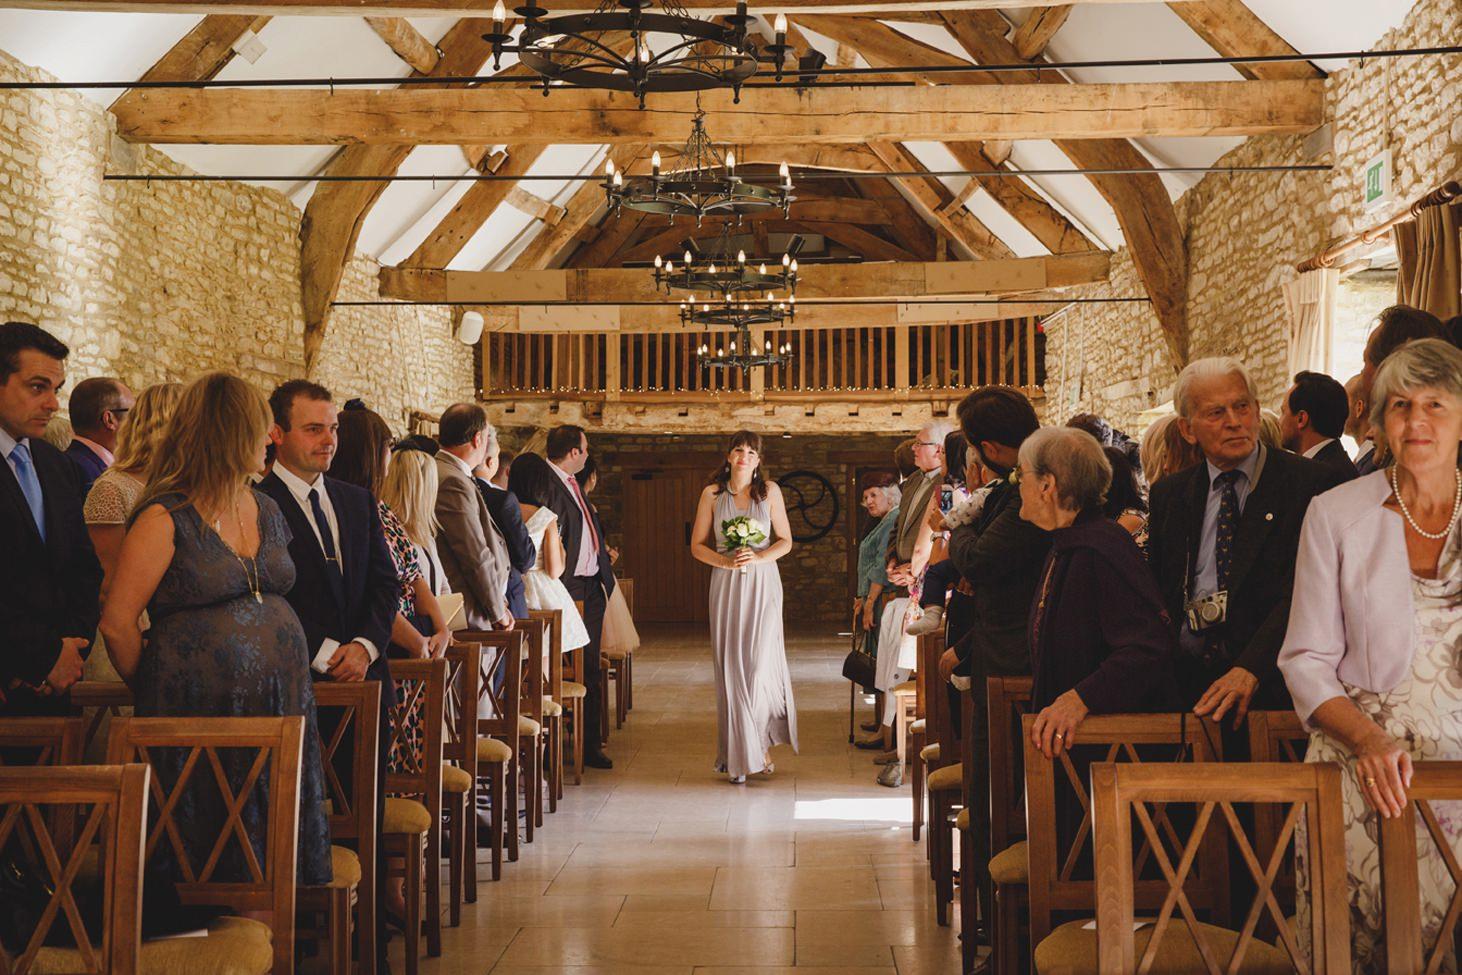 Caswell House wedding photography aisle bridesmaid